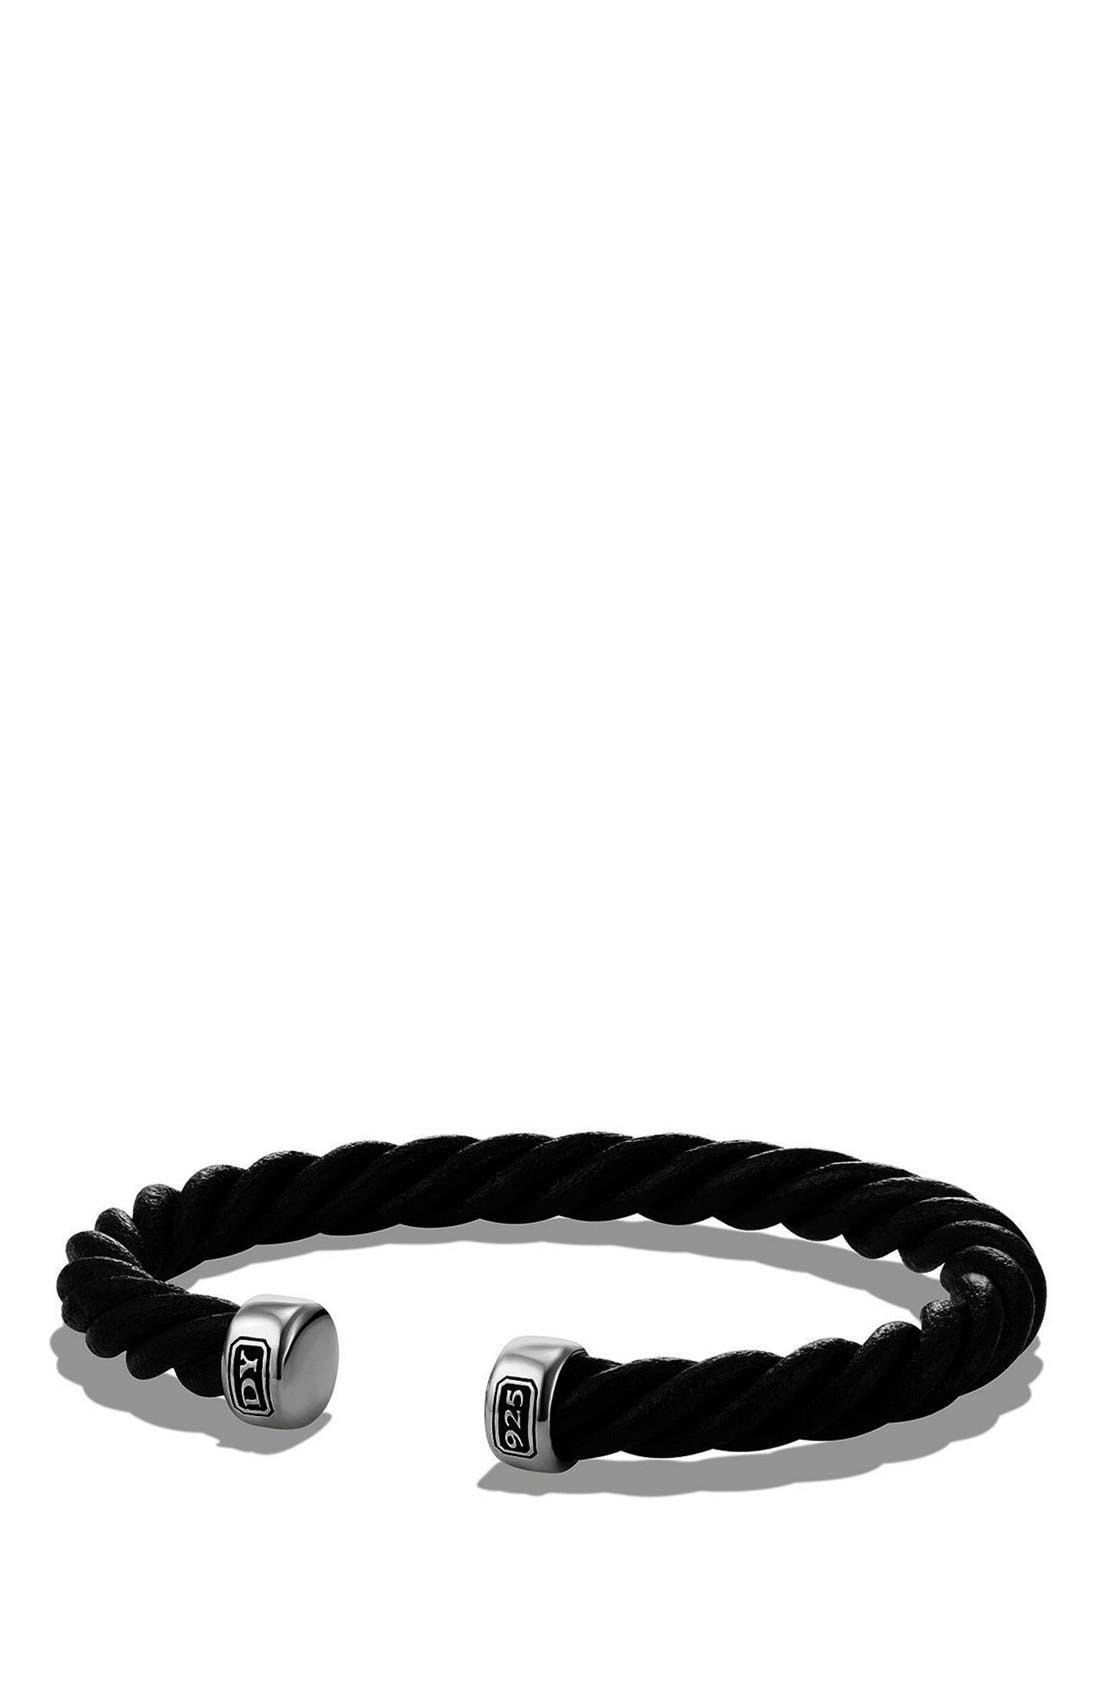 DAVID YURMAN, Leather Cuff Bracelet, Main thumbnail 1, color, SILVER/ BLACK LEATHER